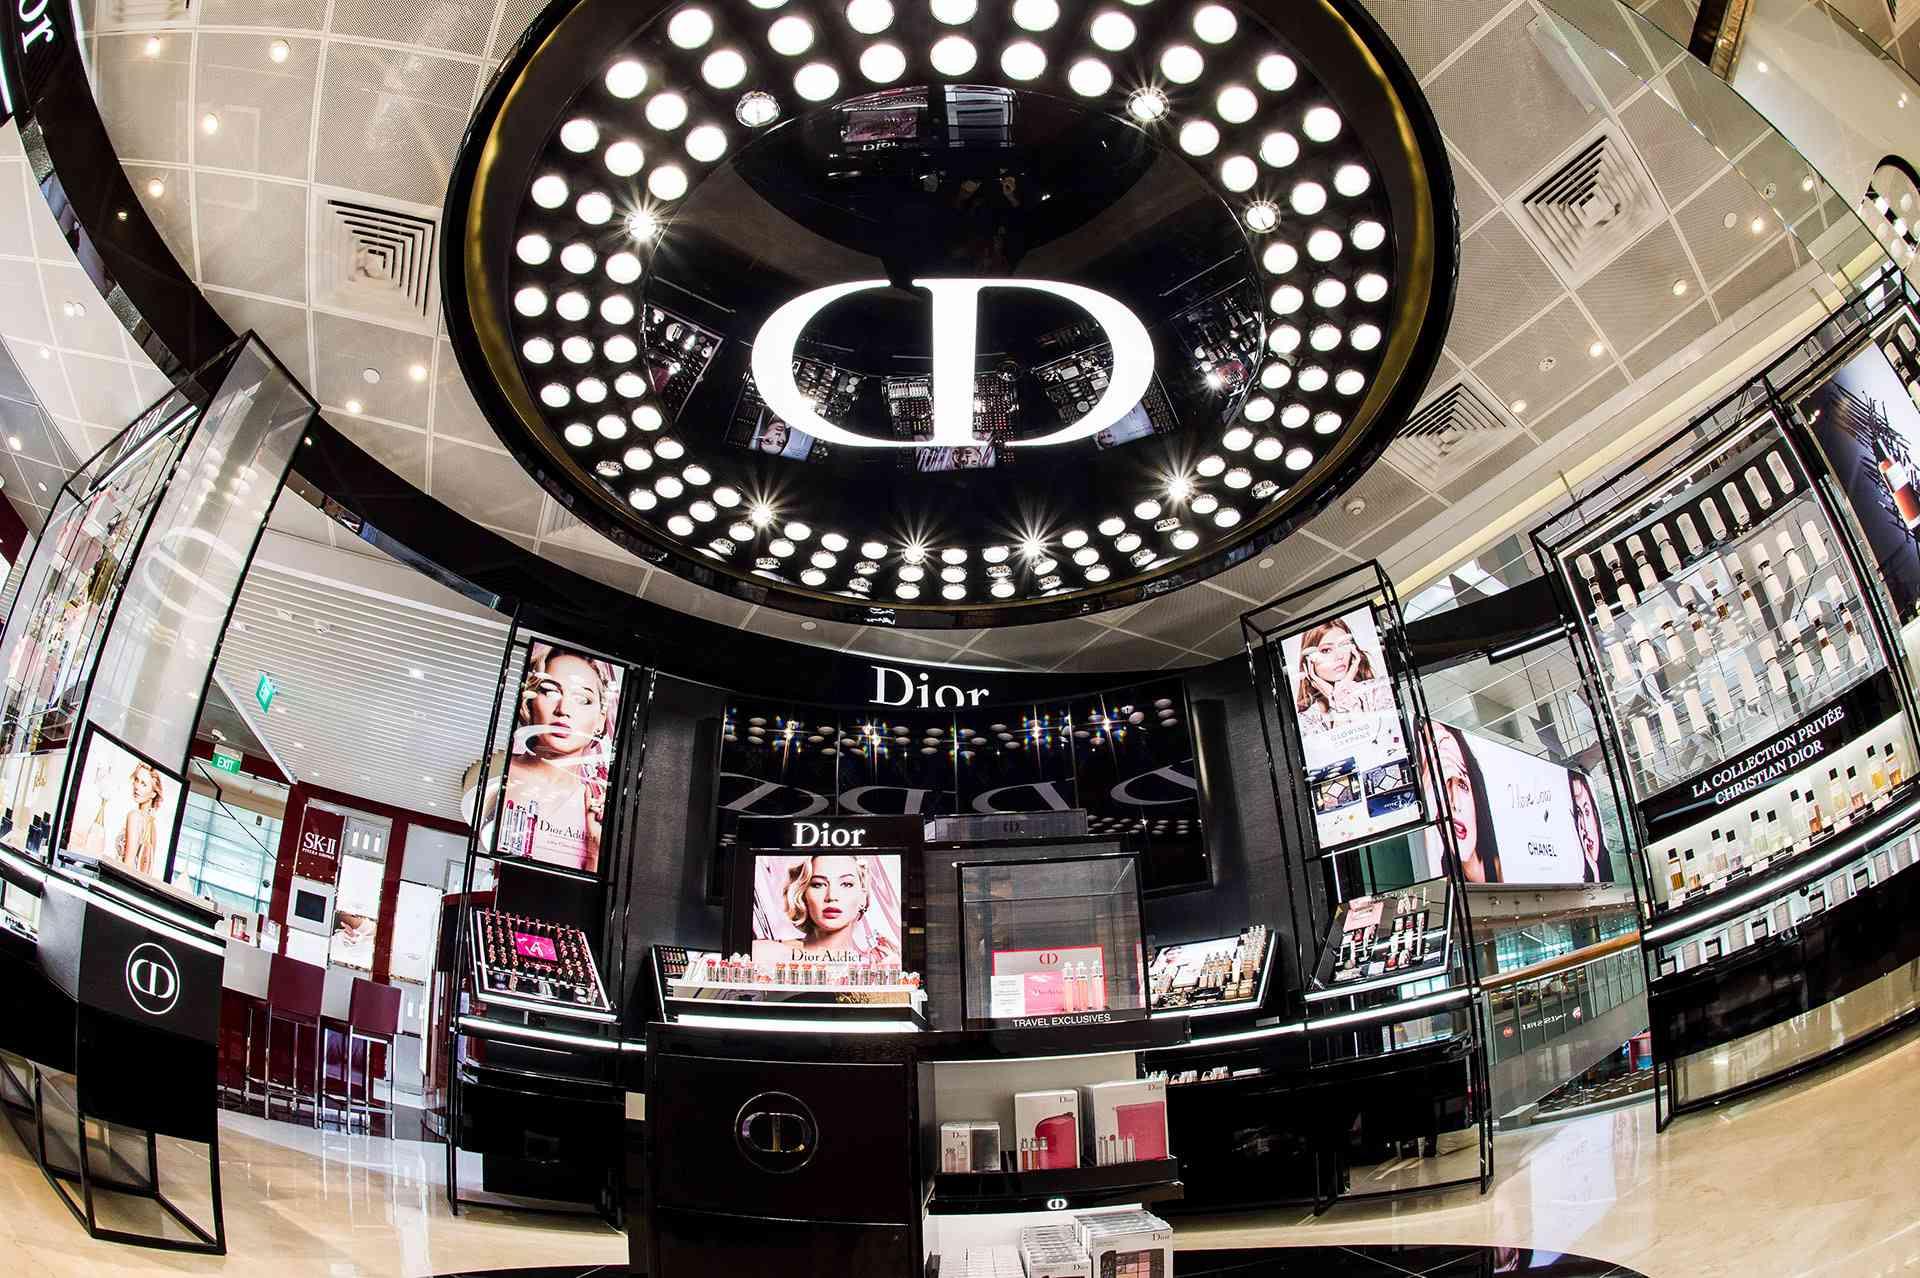 Dior Lounge, Shilla Duplex, Terminal 3, Changi Airport